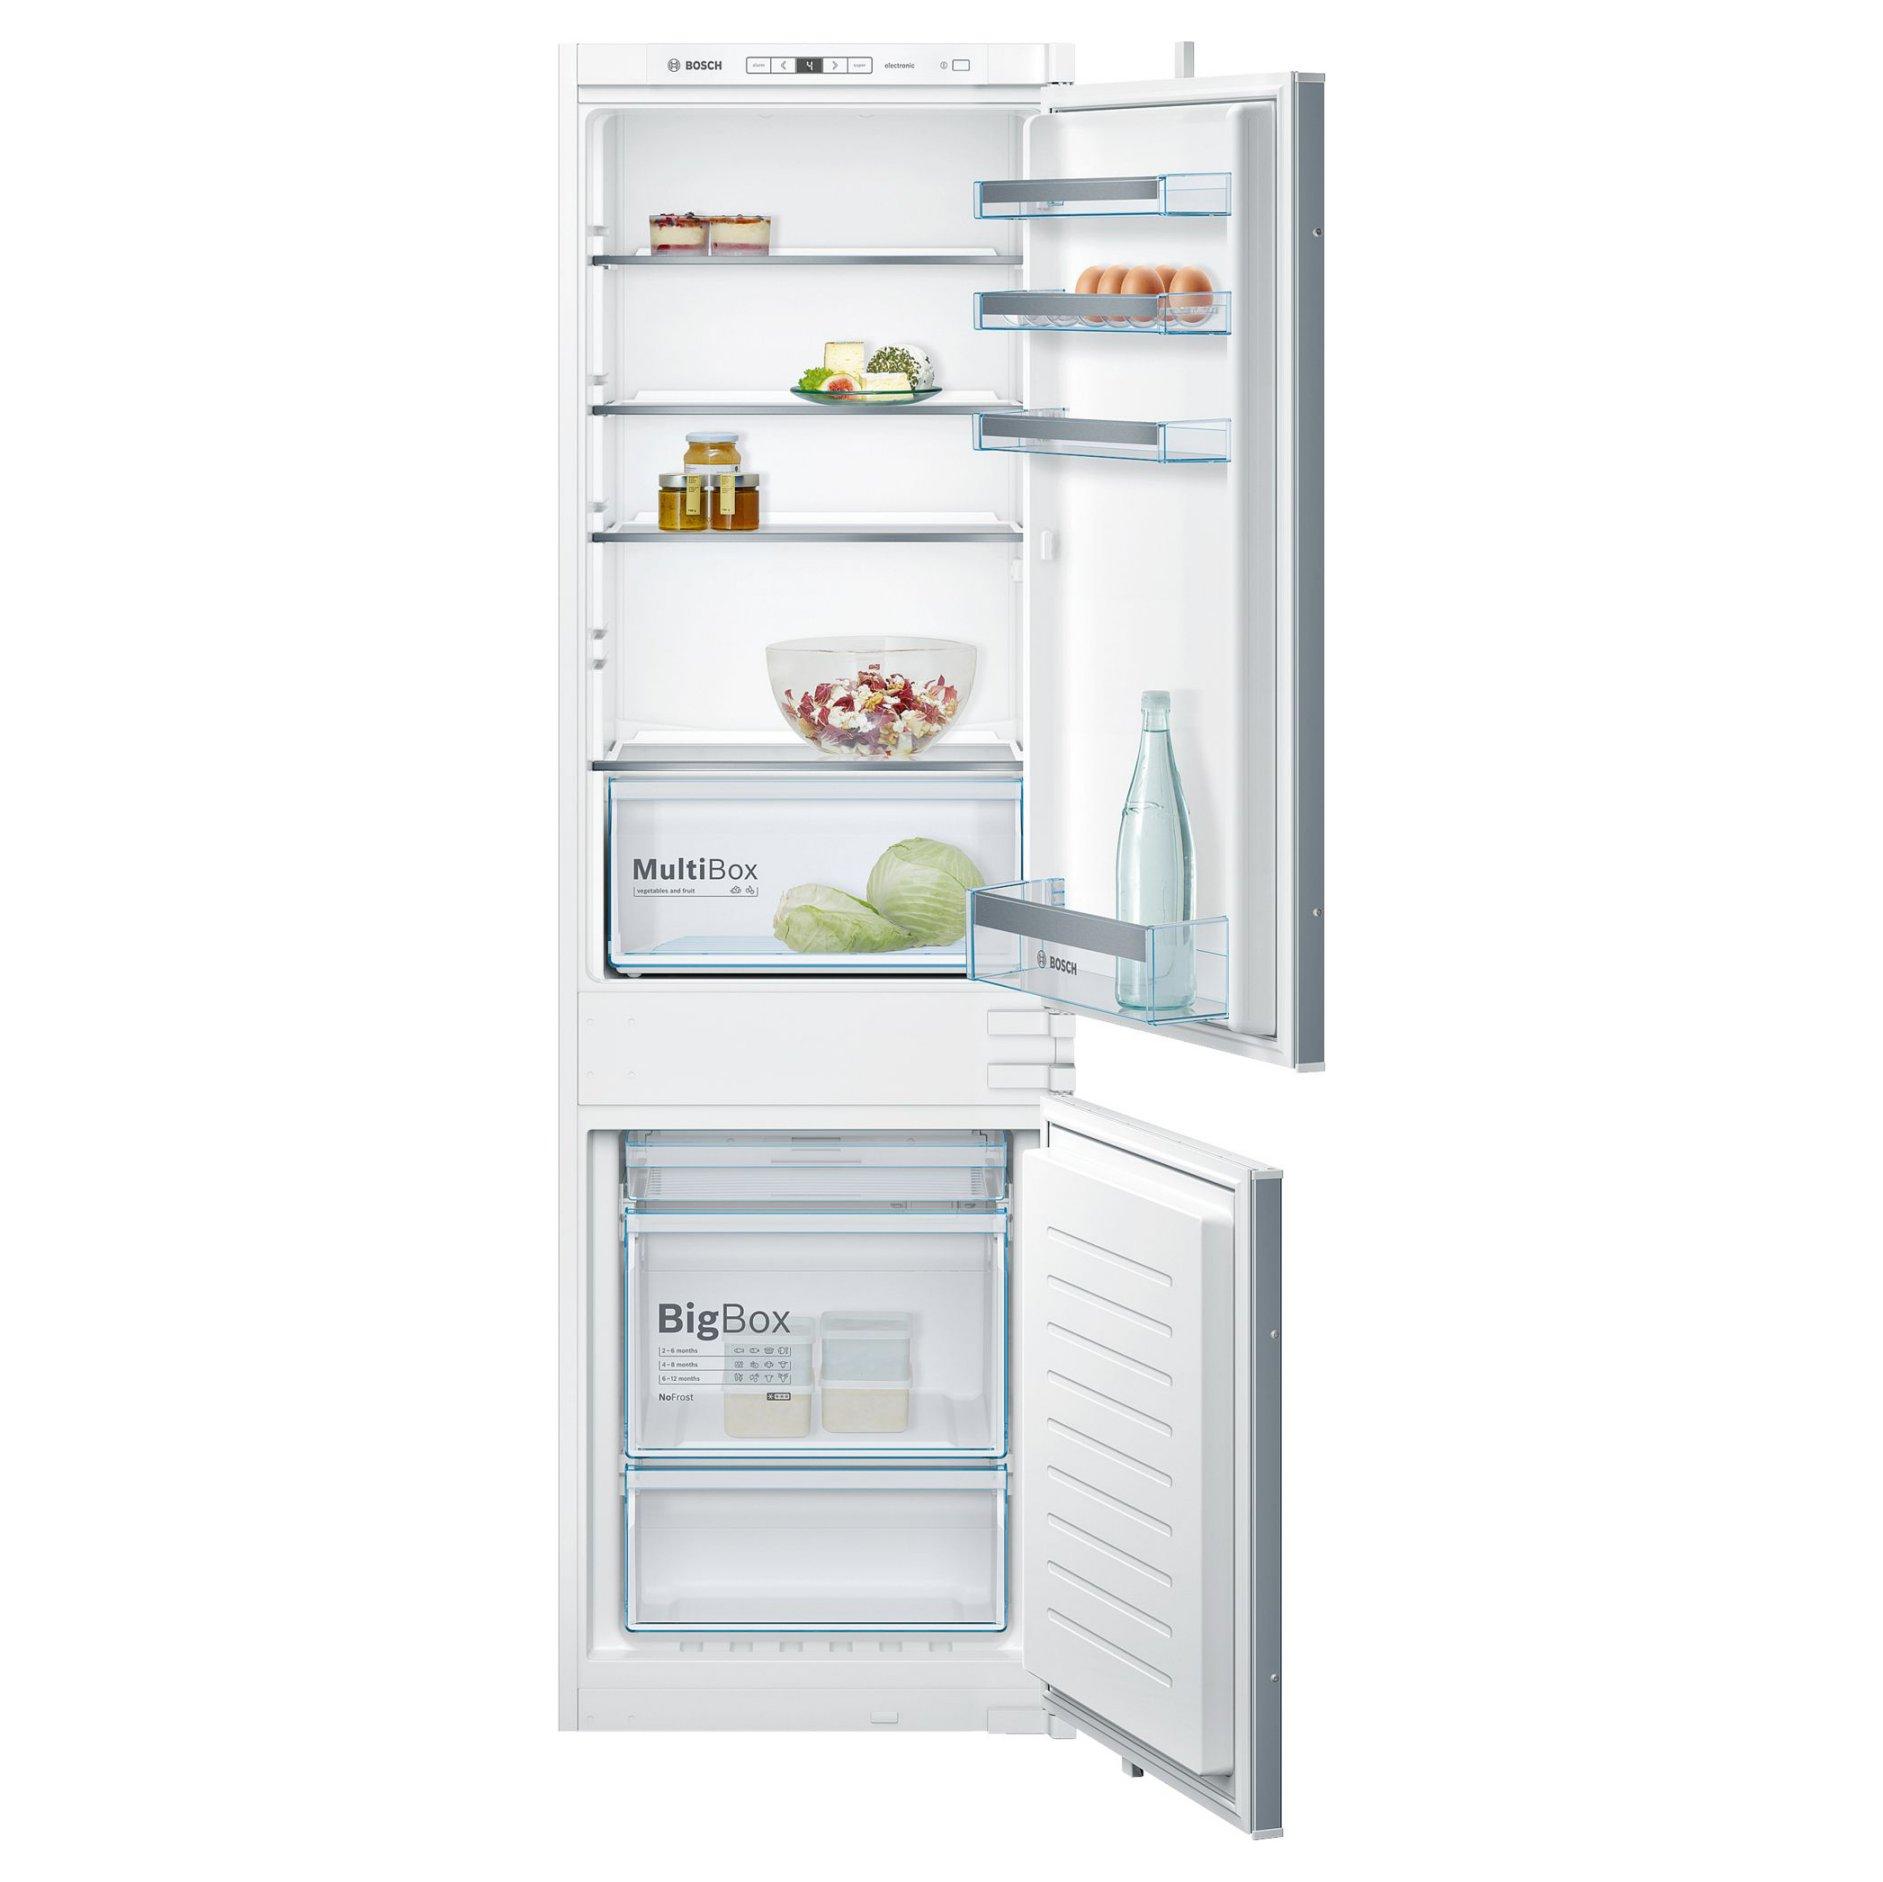 Хладилник-фризер за вграждане, KIN86VS30, BOSCH